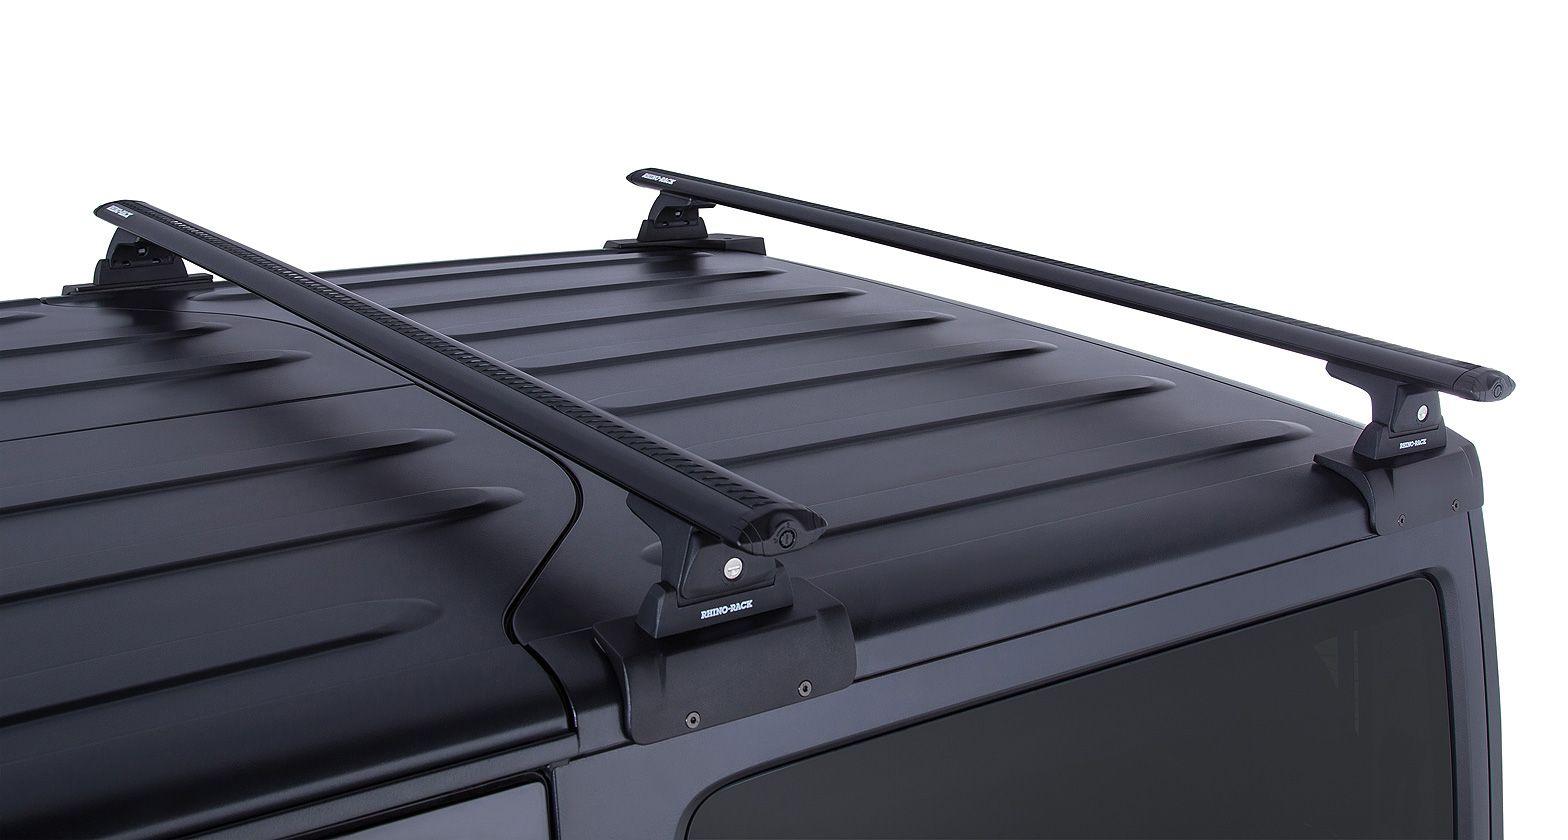 Rhino Rack Vortex Rlt600 Black 2 Bar Backbone Roof Rack For 2 Door Wrangler Jk Ja6382 Patio Roof Corrugated Plastic Roofing Plastic Roofing